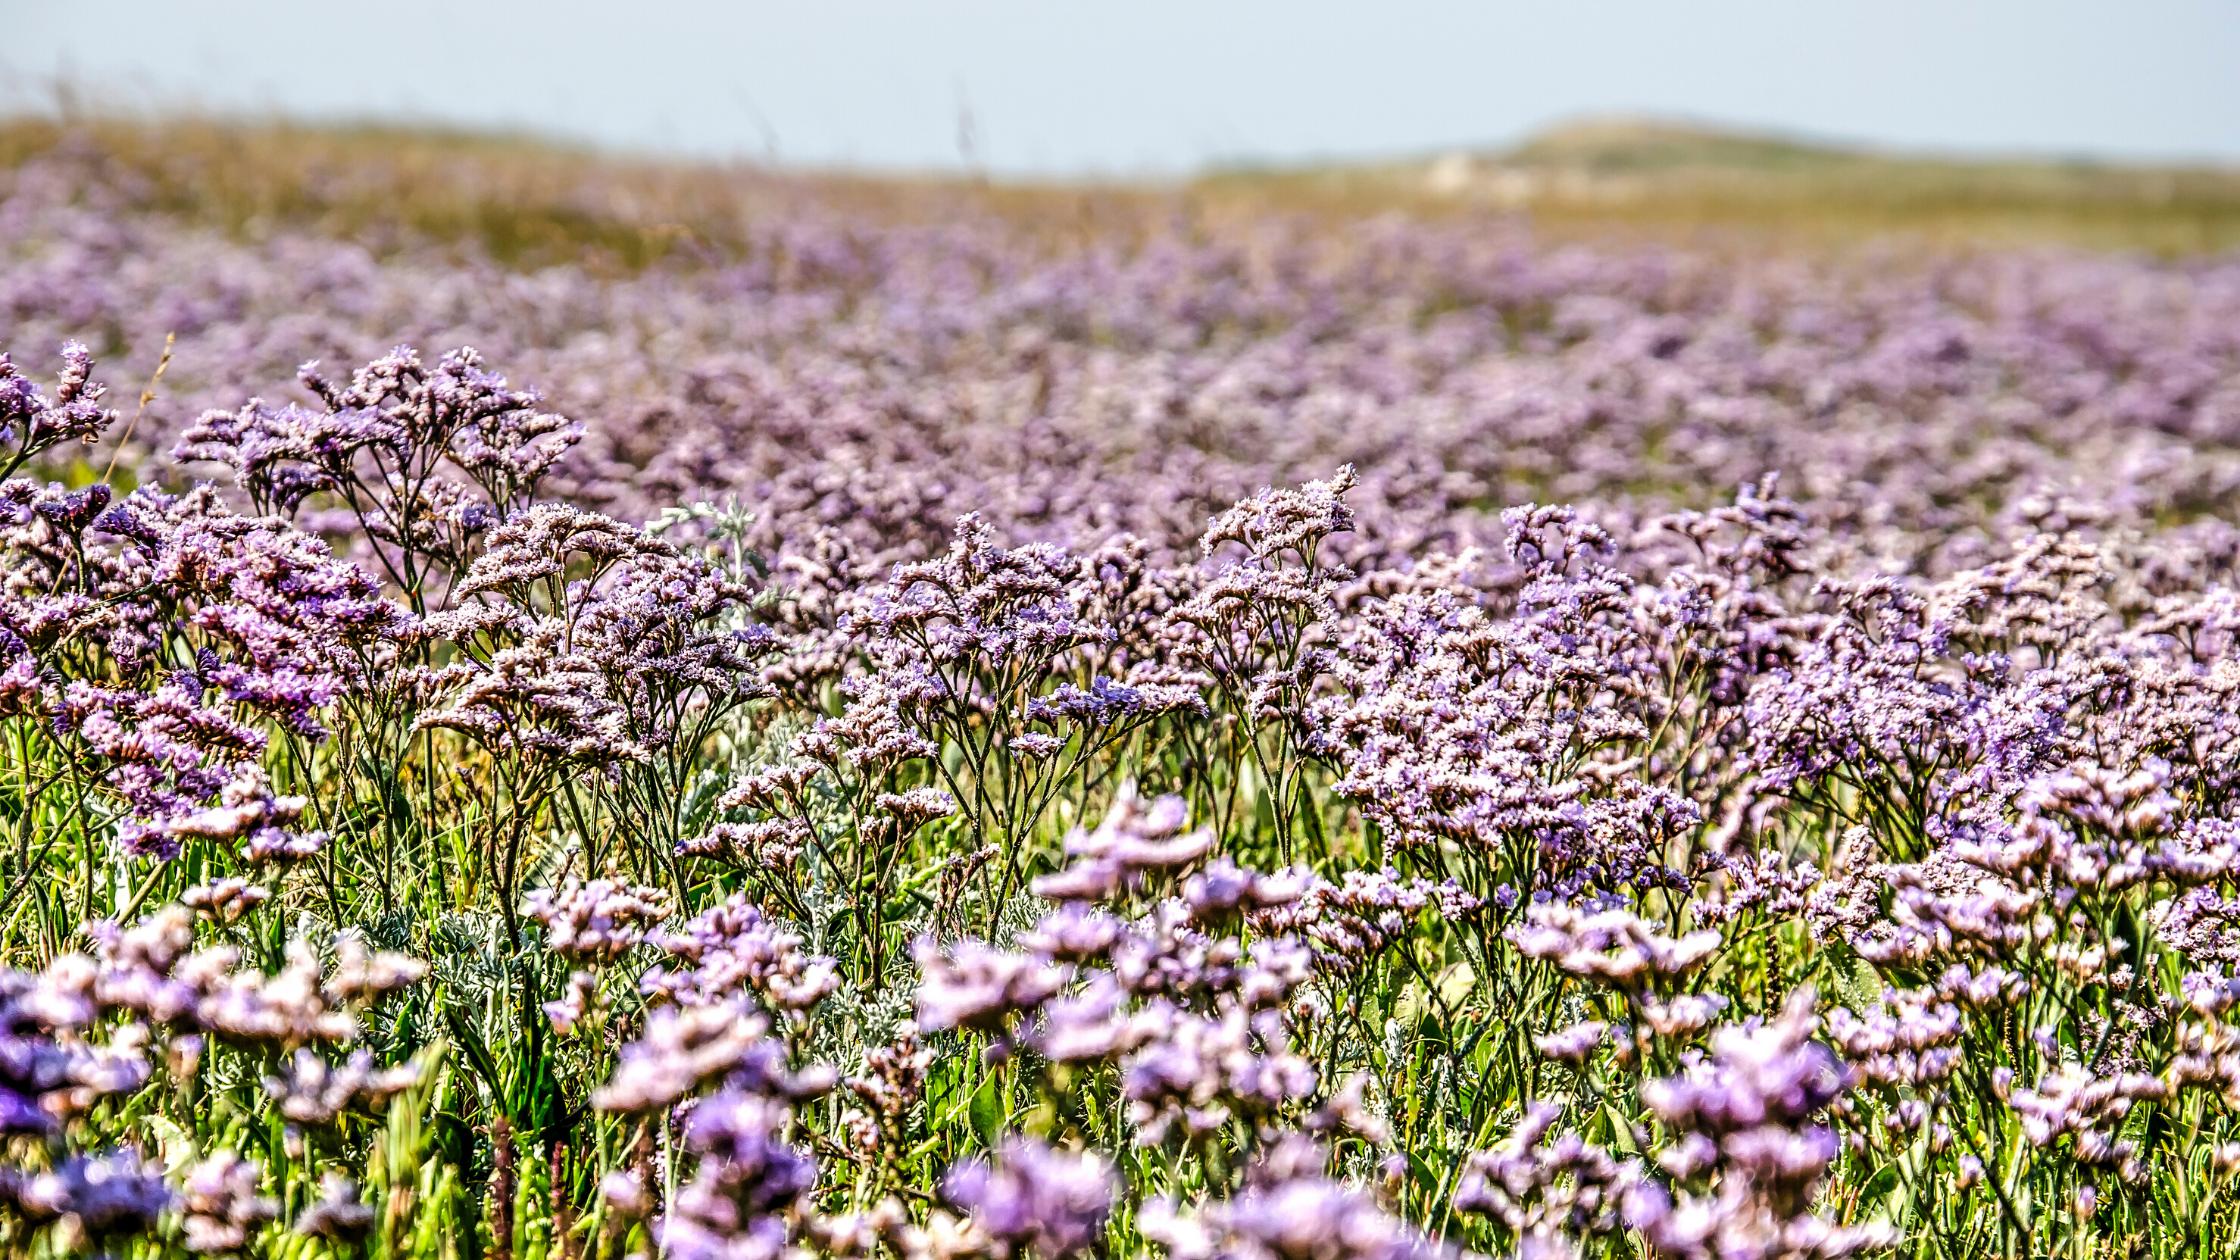 Purple sea lavender in bloom on Wadden Island Texel